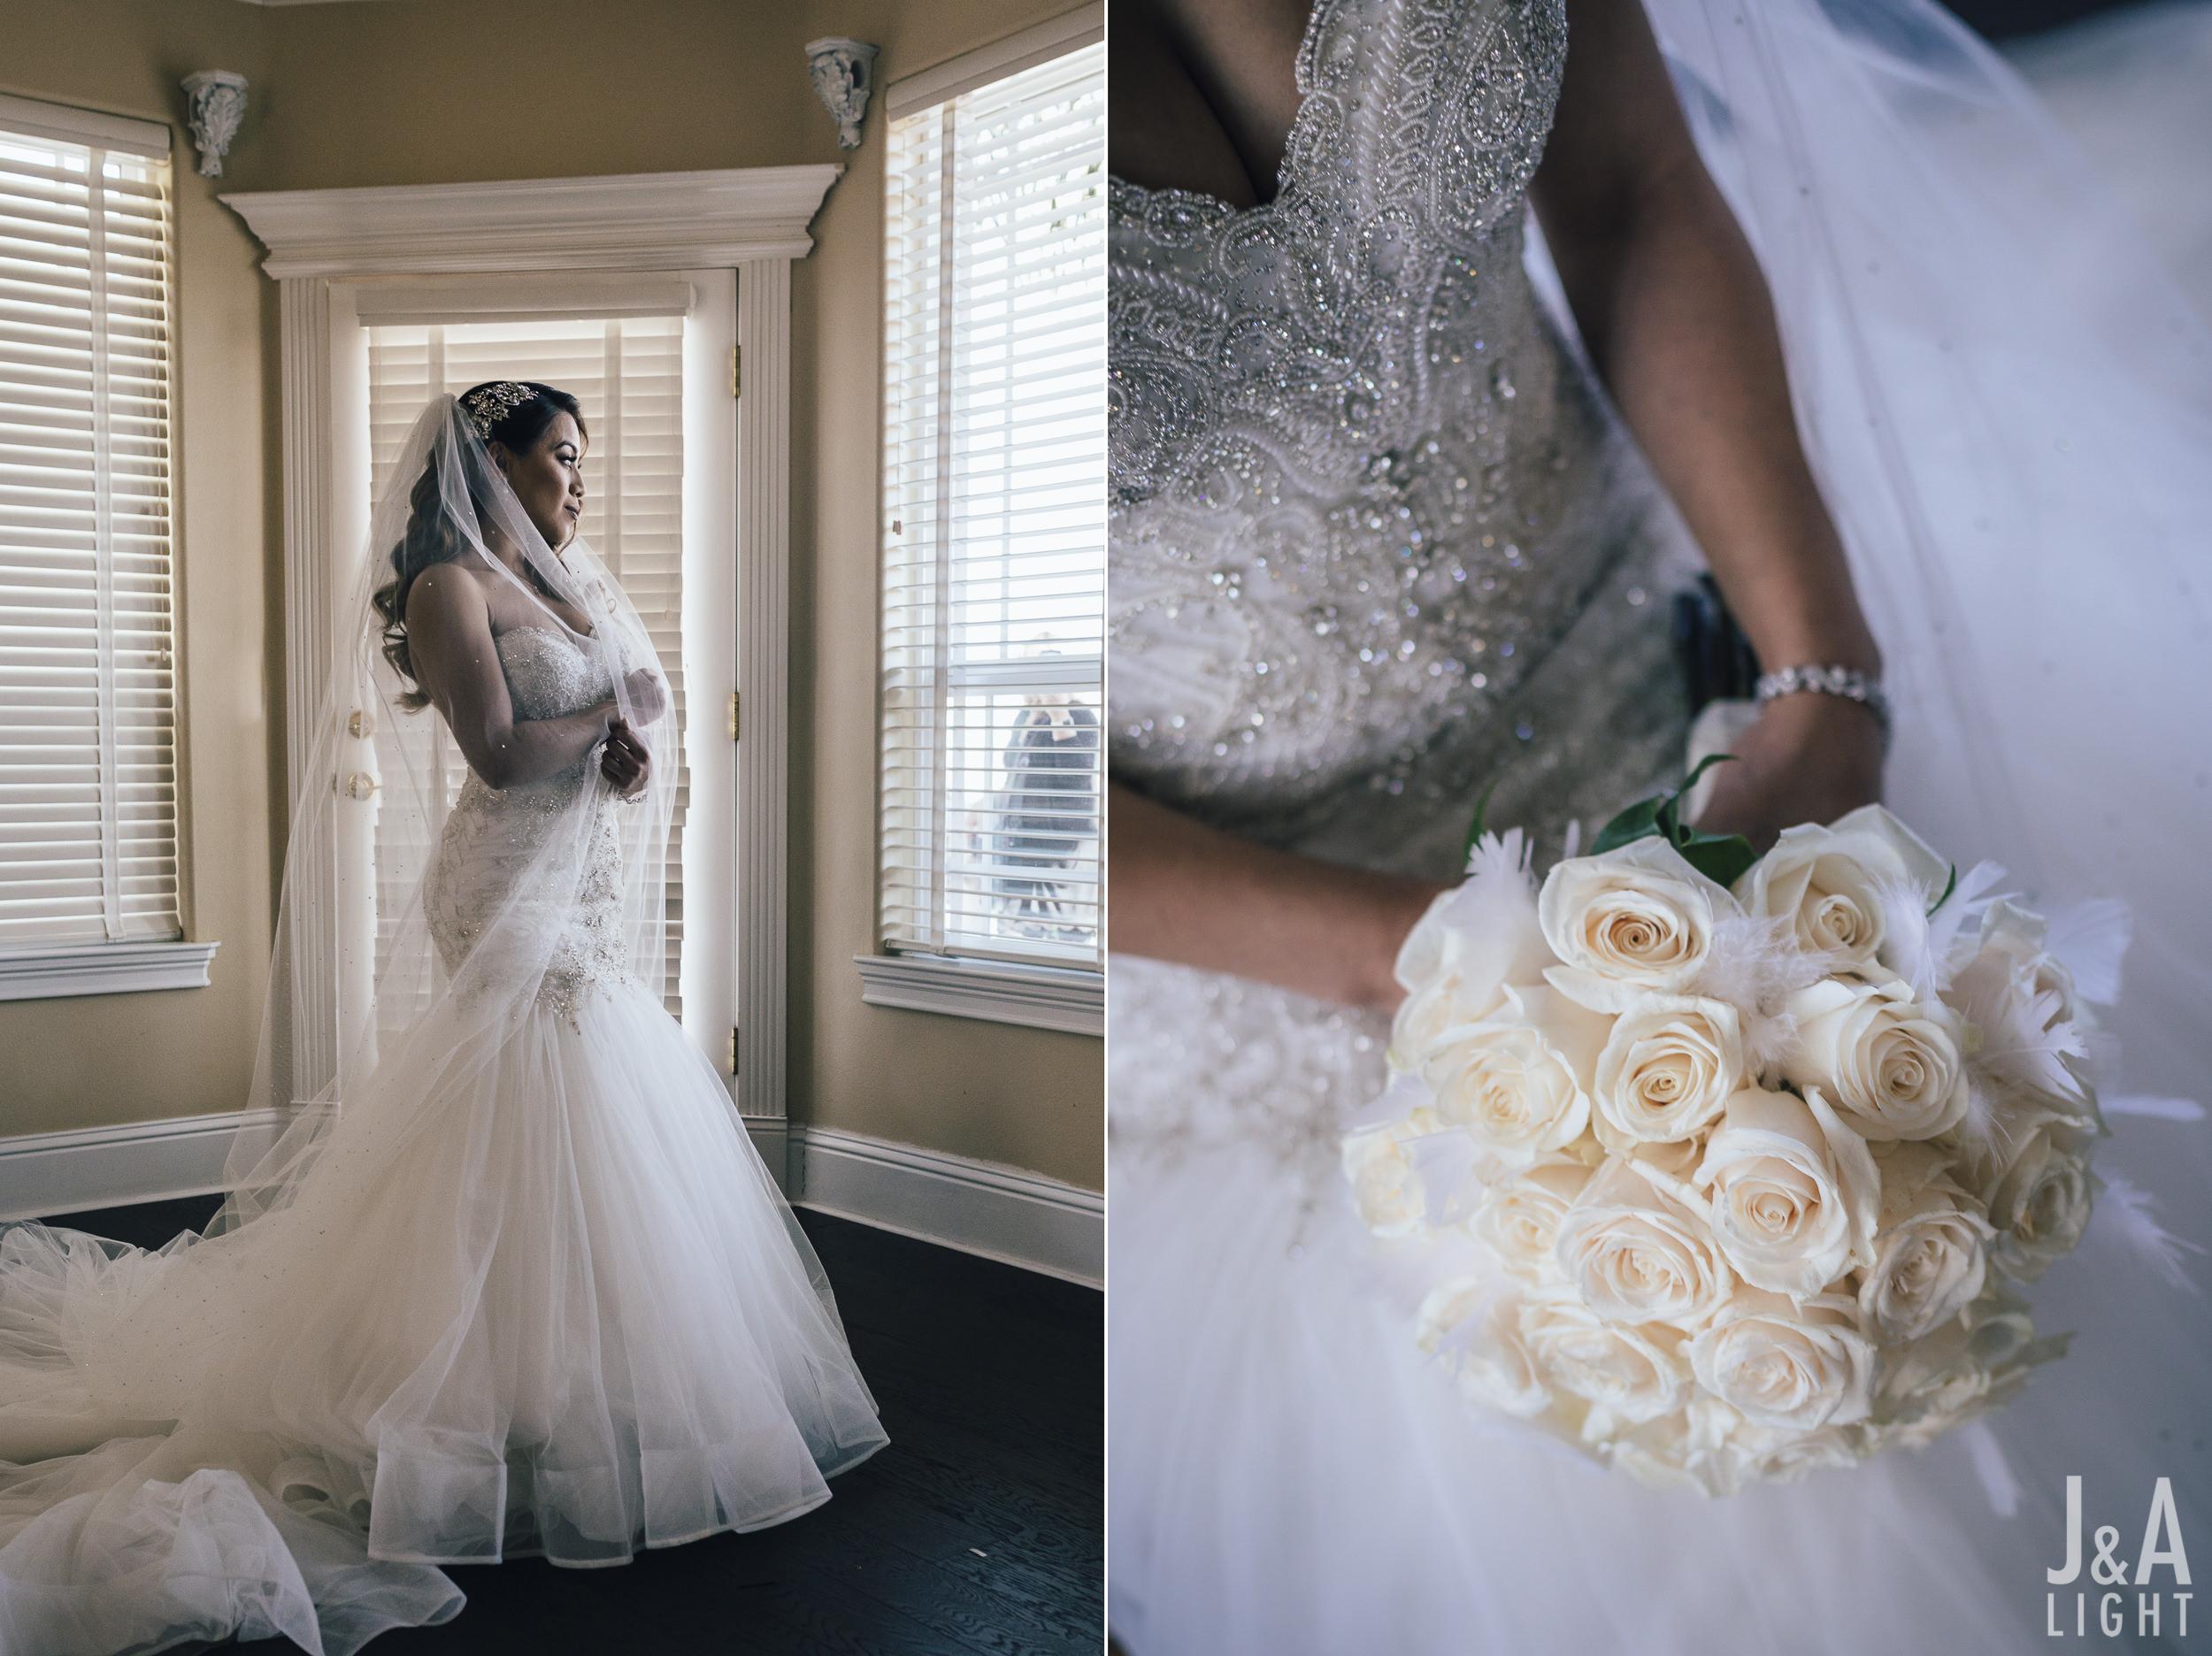 20171014-JanDan-LosBanos-GlassMansion-Wedding-Blog-016.jpg